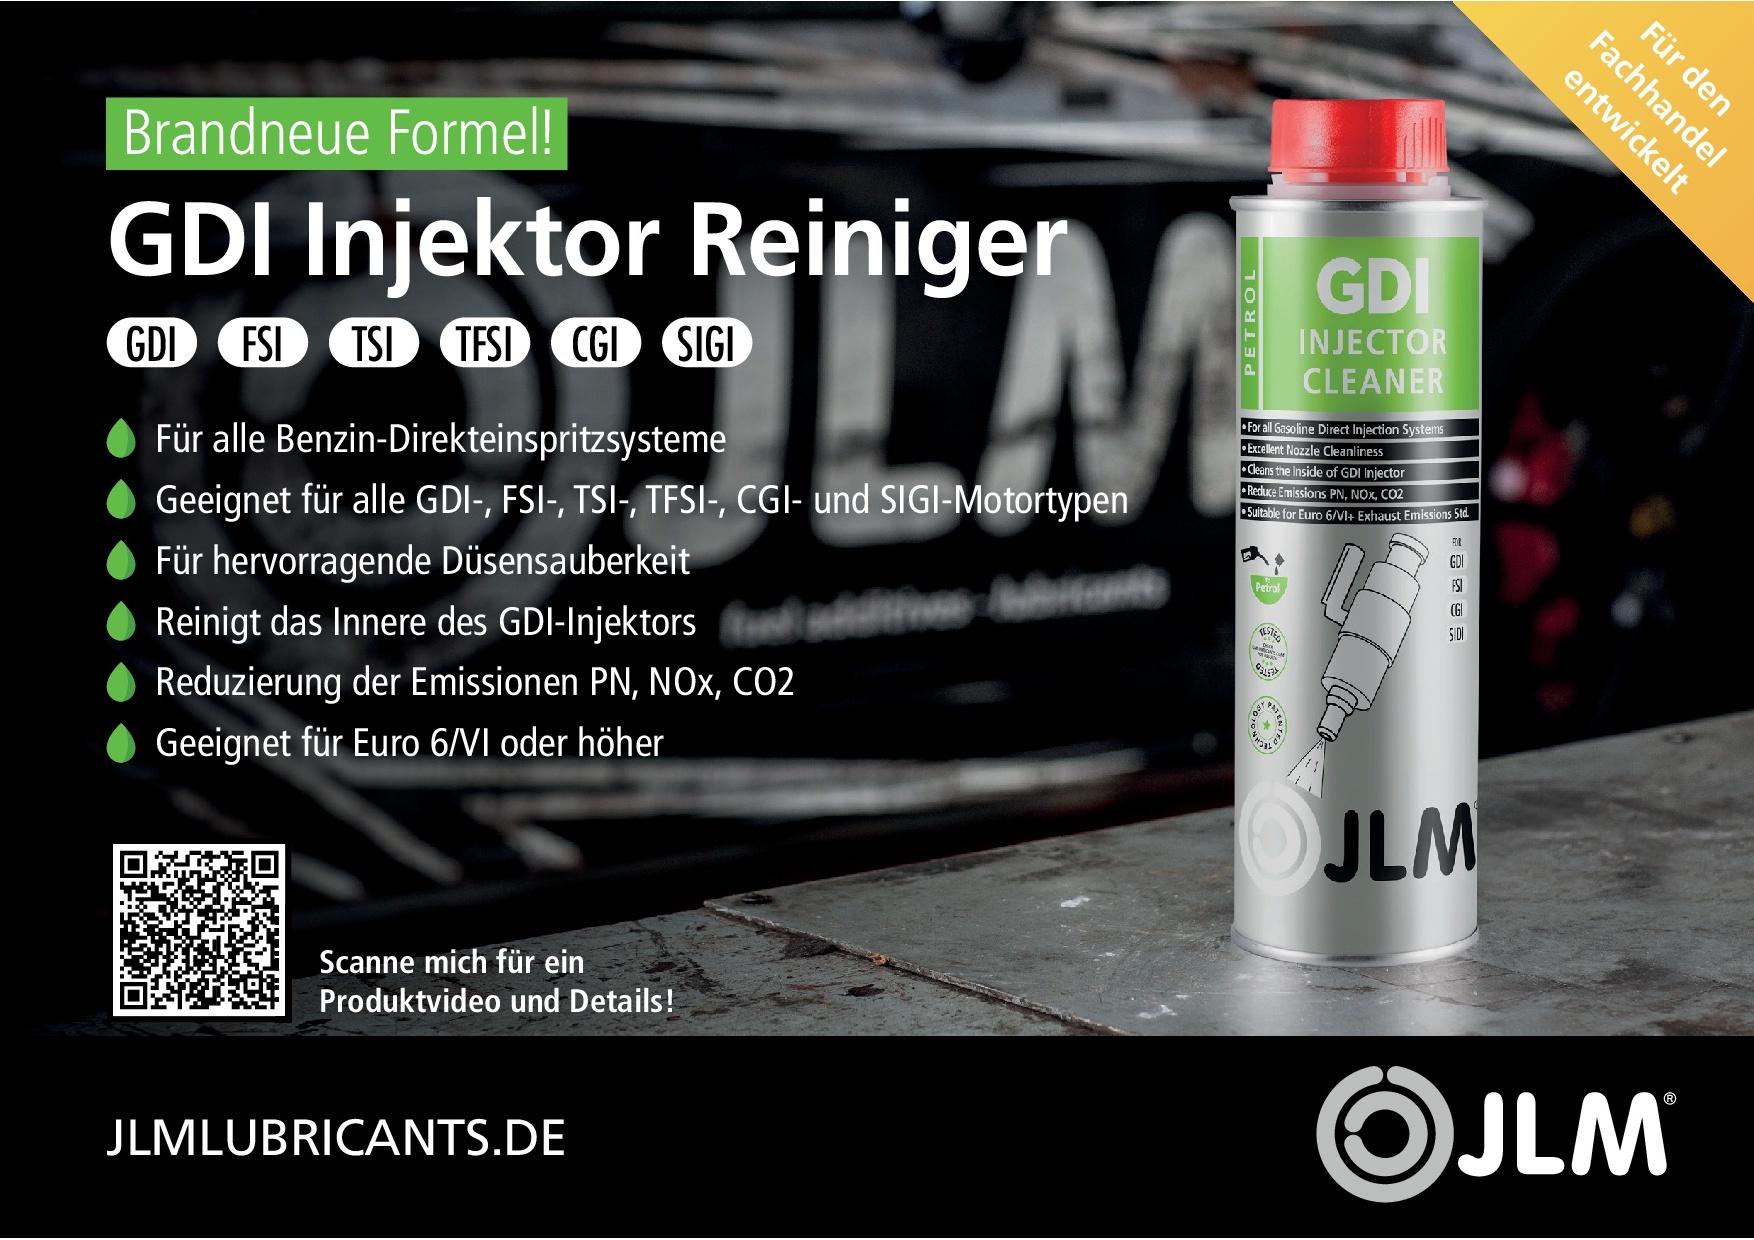 GDI Injektor Reiniger